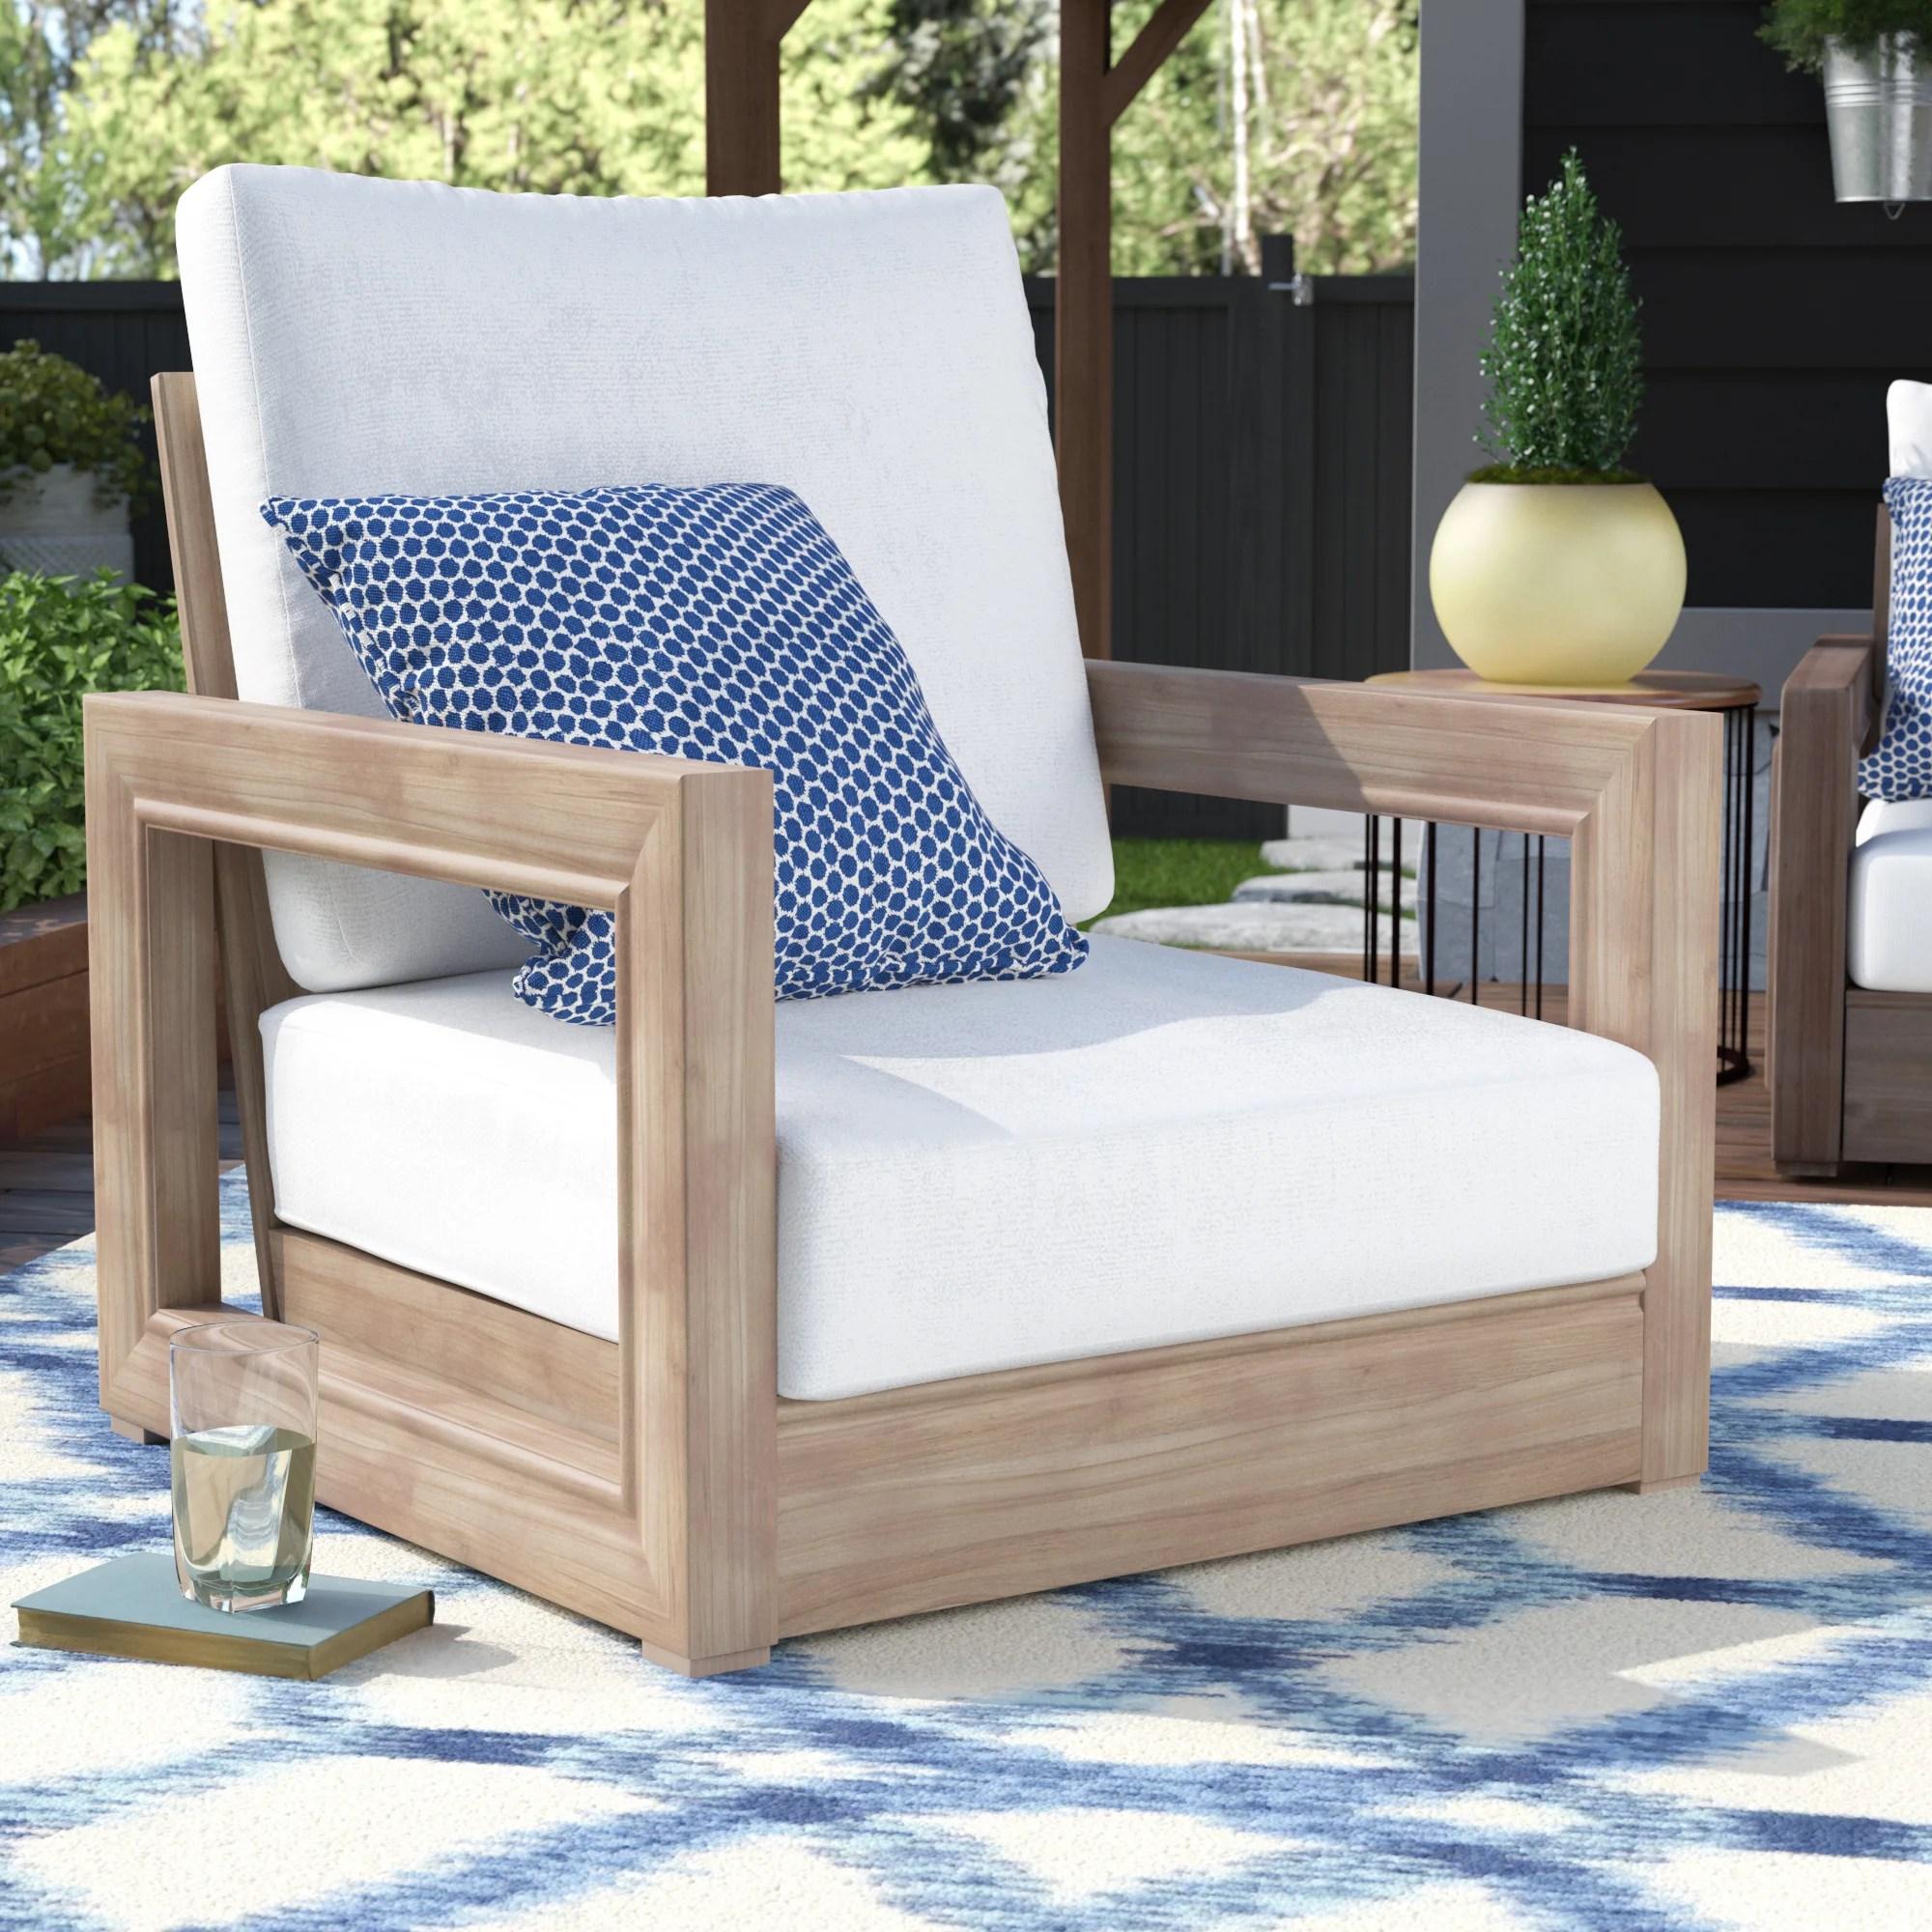 patio club chair cheap kitchen table chairs brayden studio constance teak outdoor furniture with cushions wayfair